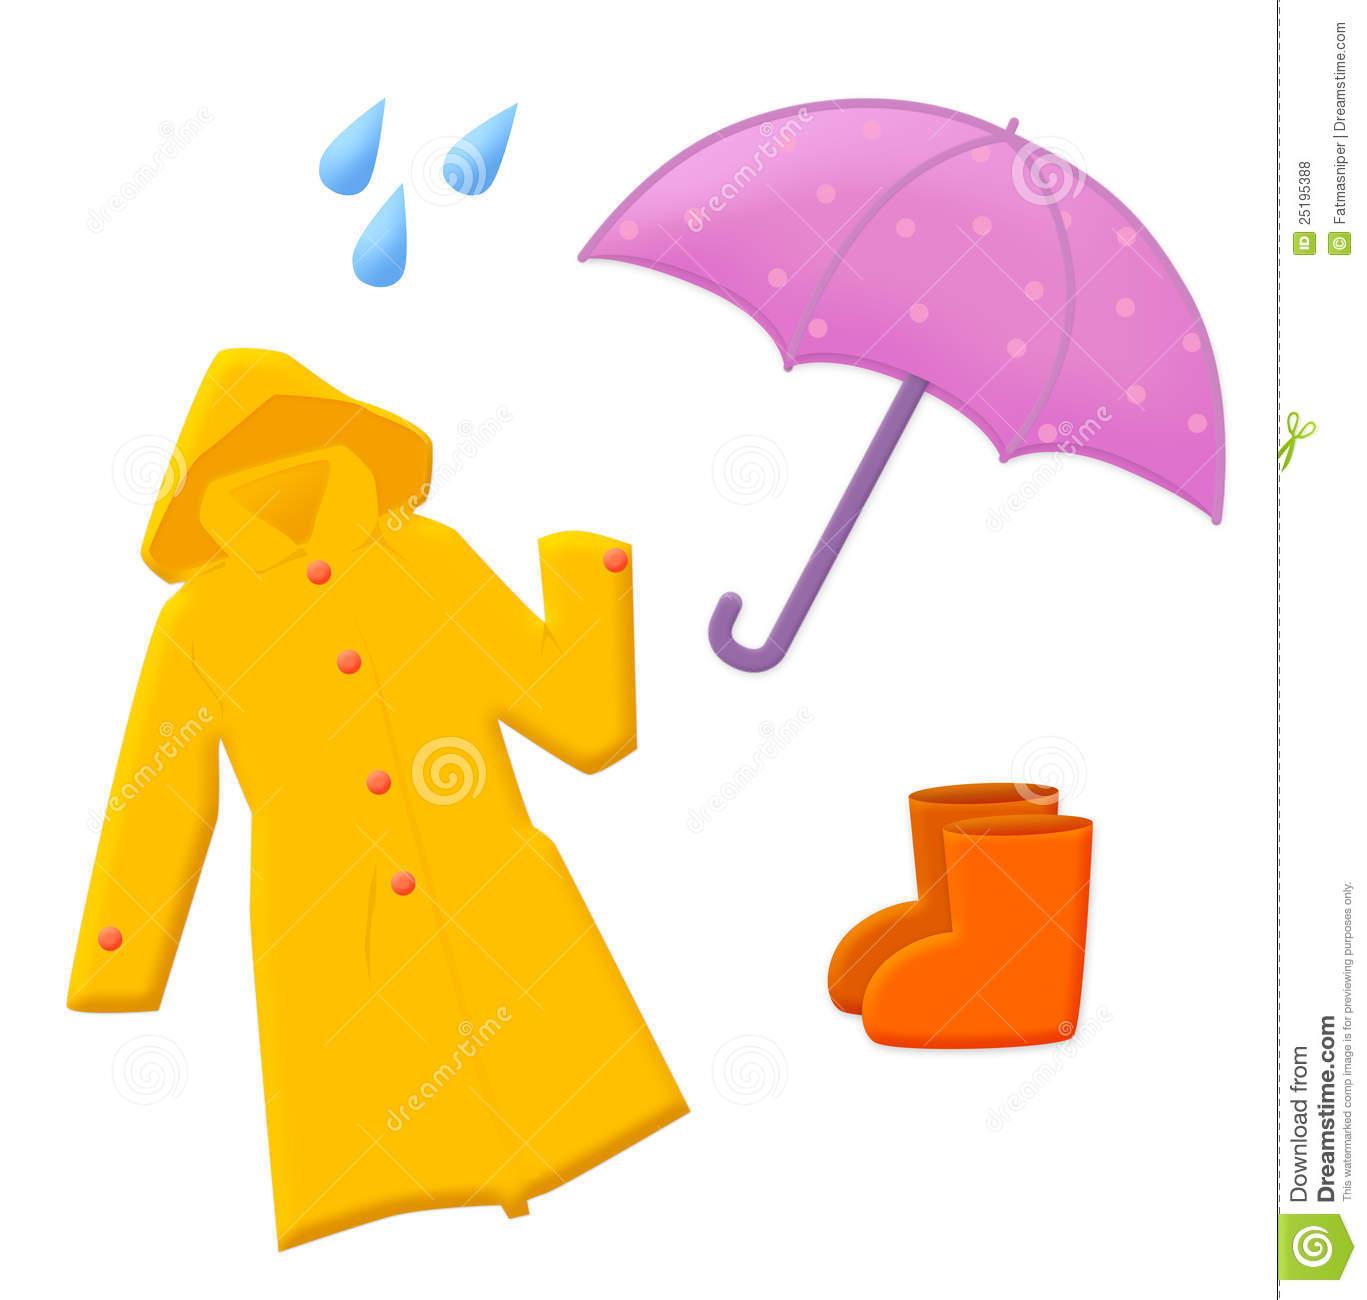 Raining Day Clipart | Free download best Raining Day Clipart ... jpg freeuse download